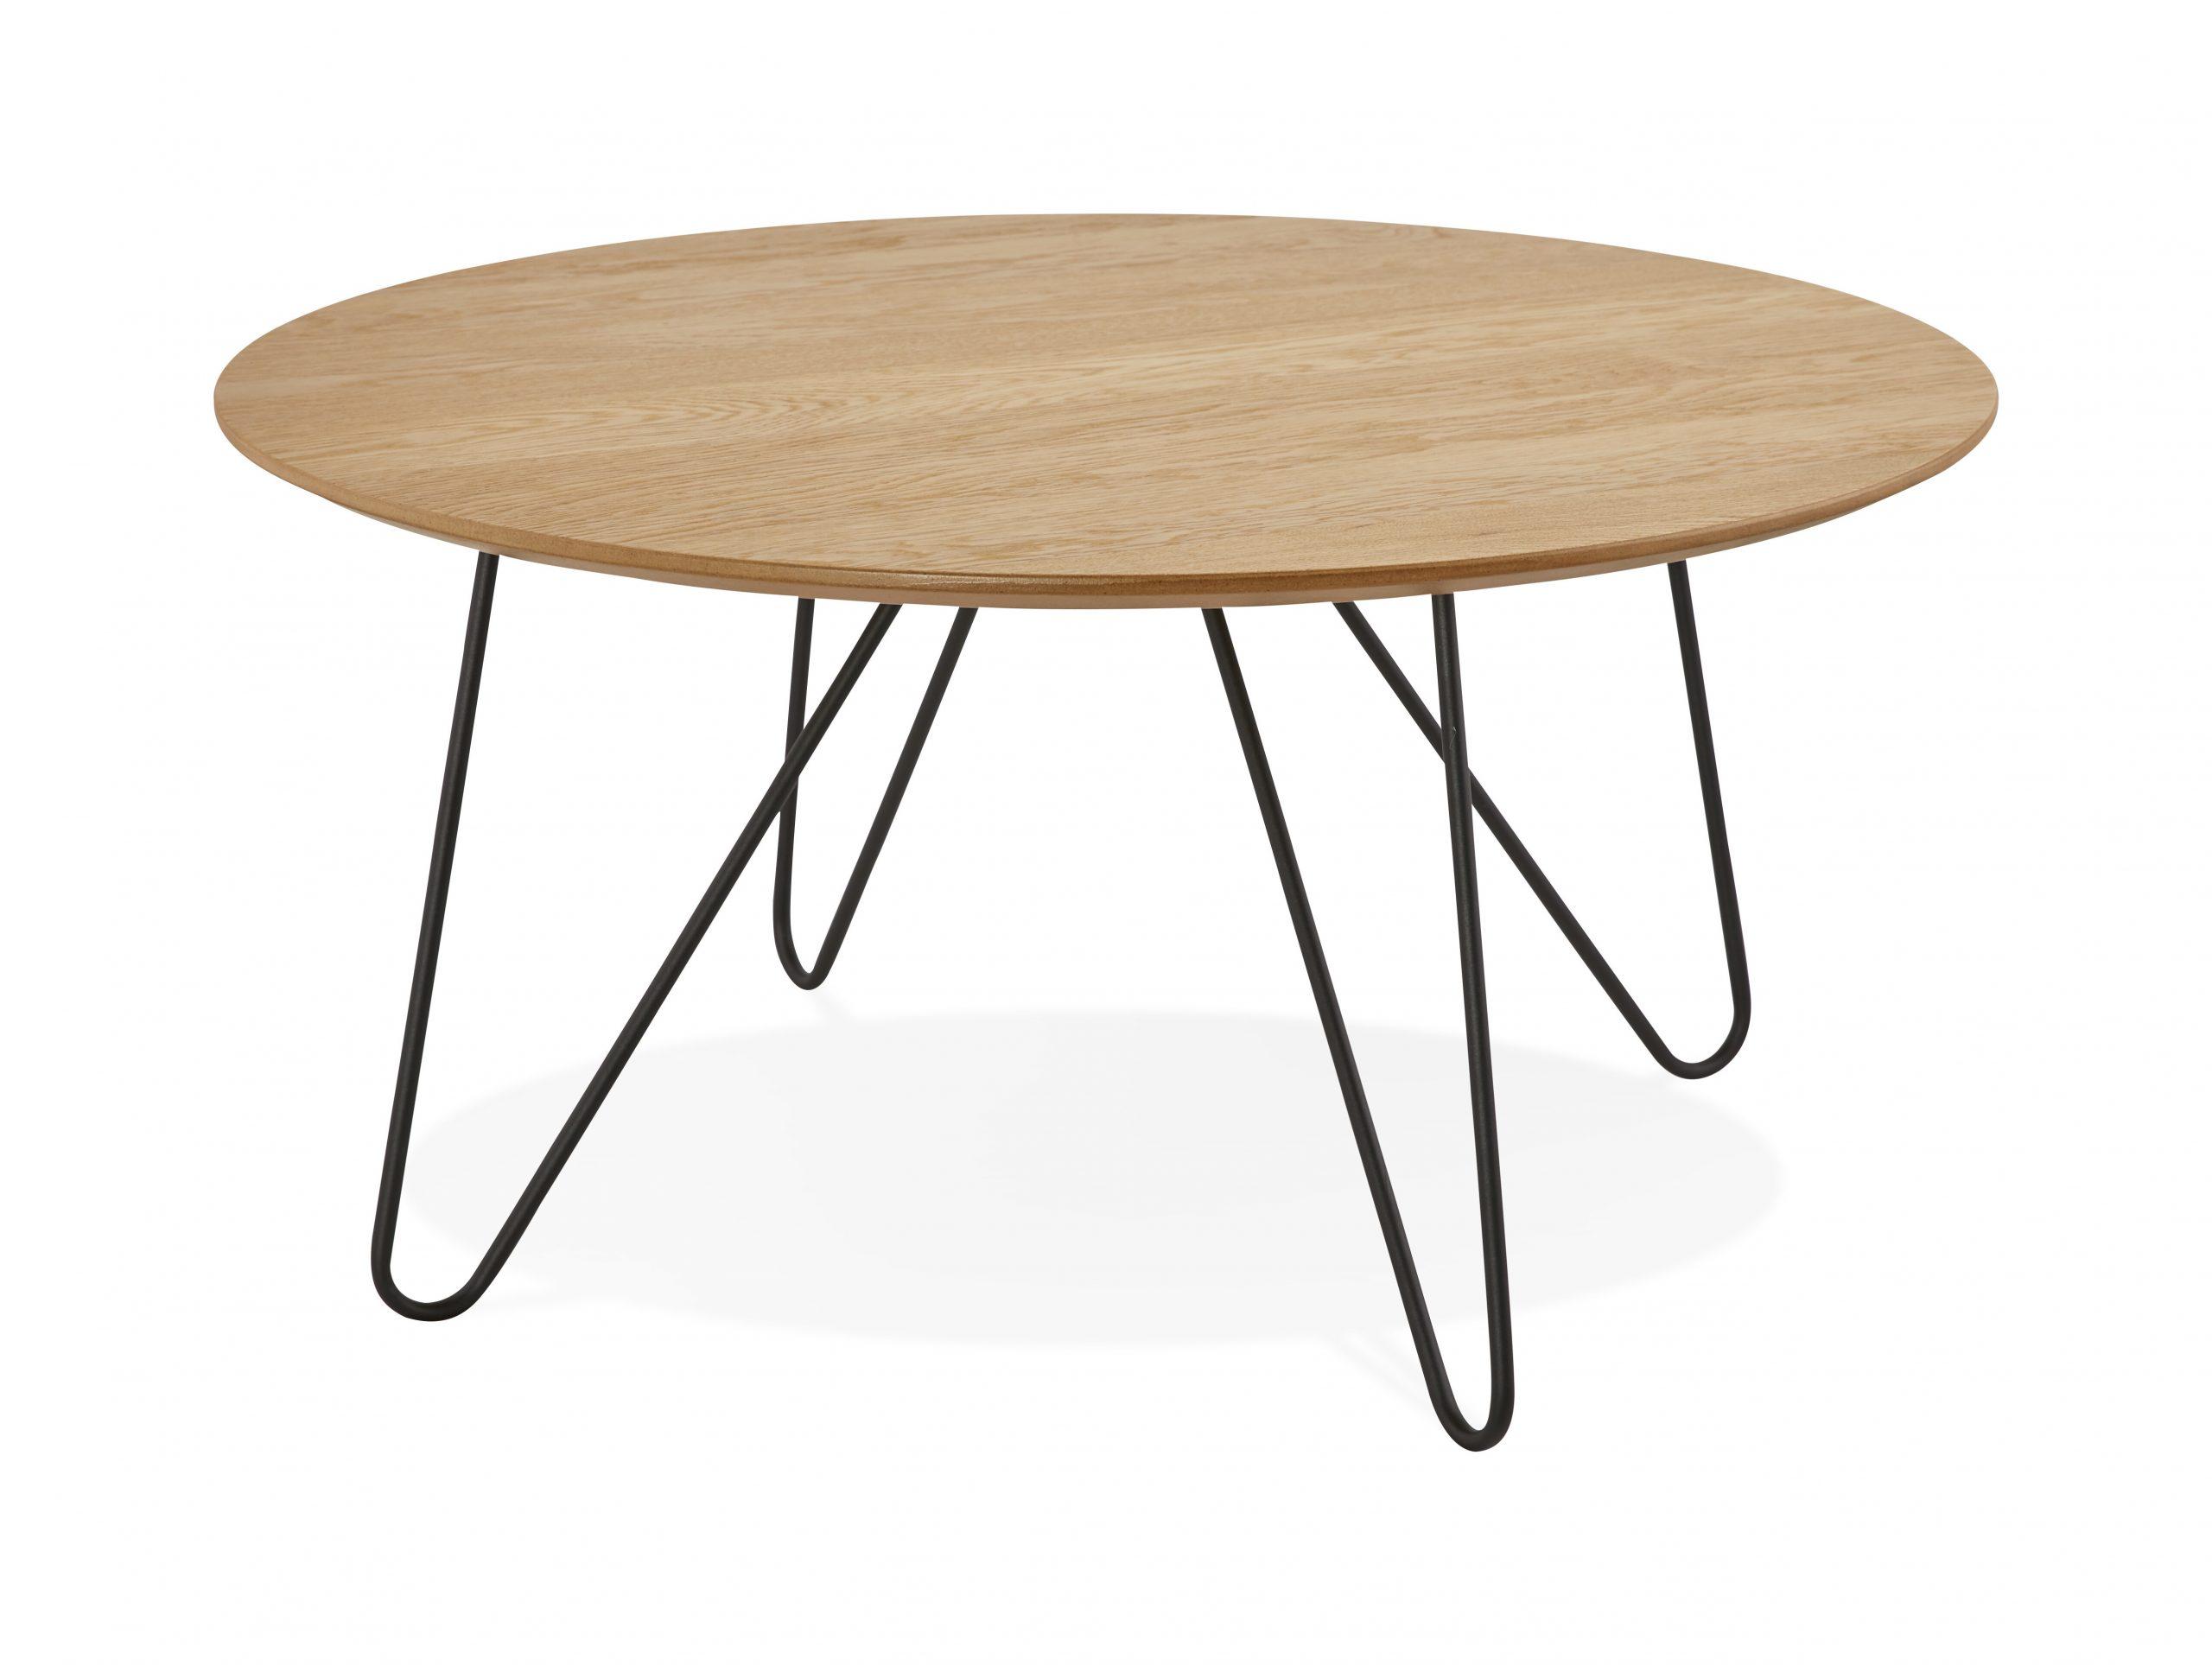 Kokoon Design Salontafel 'Runda', kleur Naturel | Kokoon Design